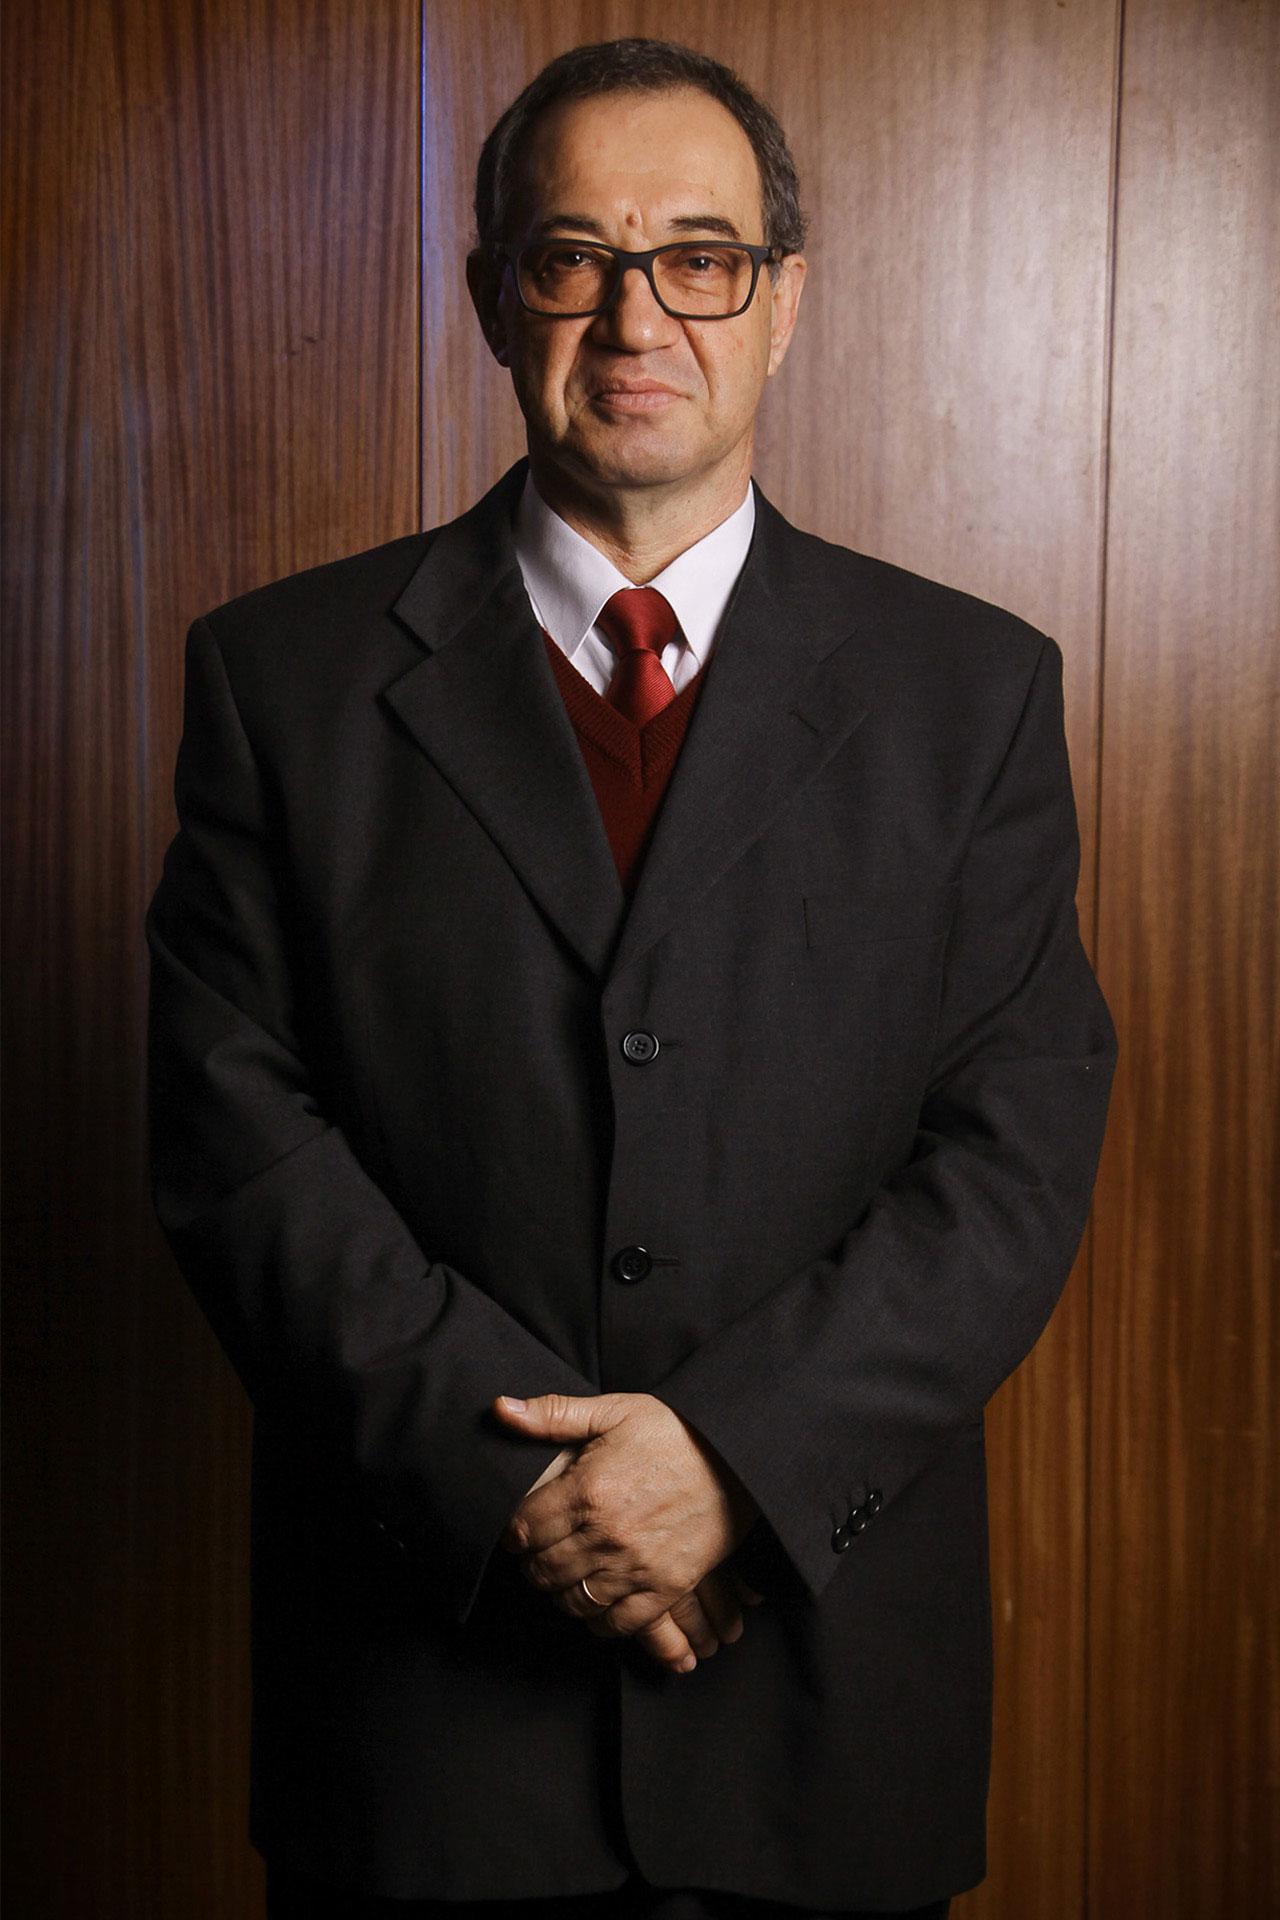 Manuel Gaspar Tuba